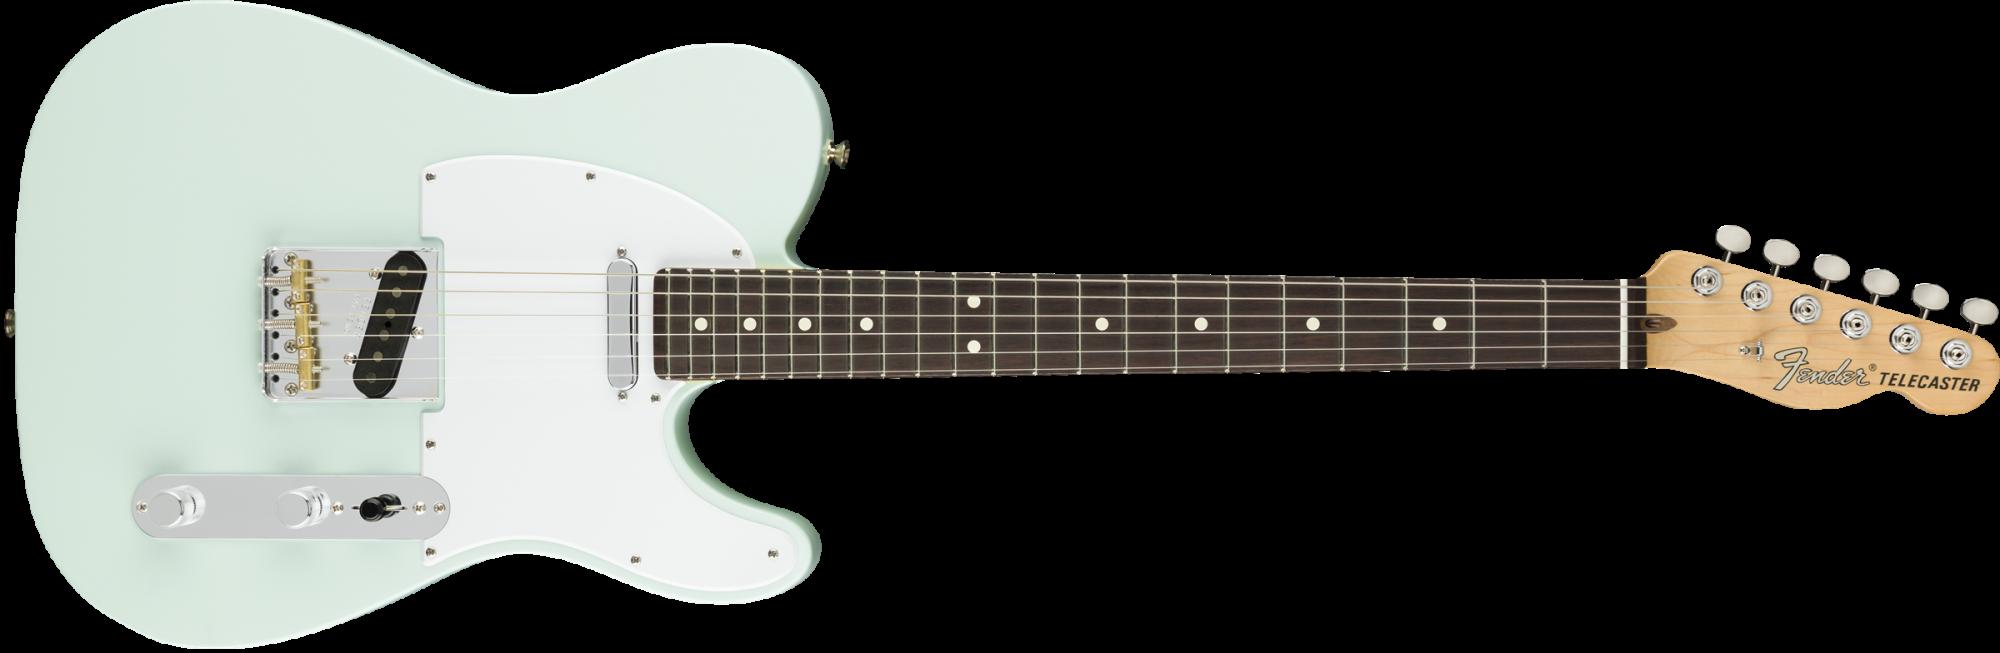 Fender American Performer Telecaster Guitar - Rosewood Fingerboard - Satin Sonic Blue